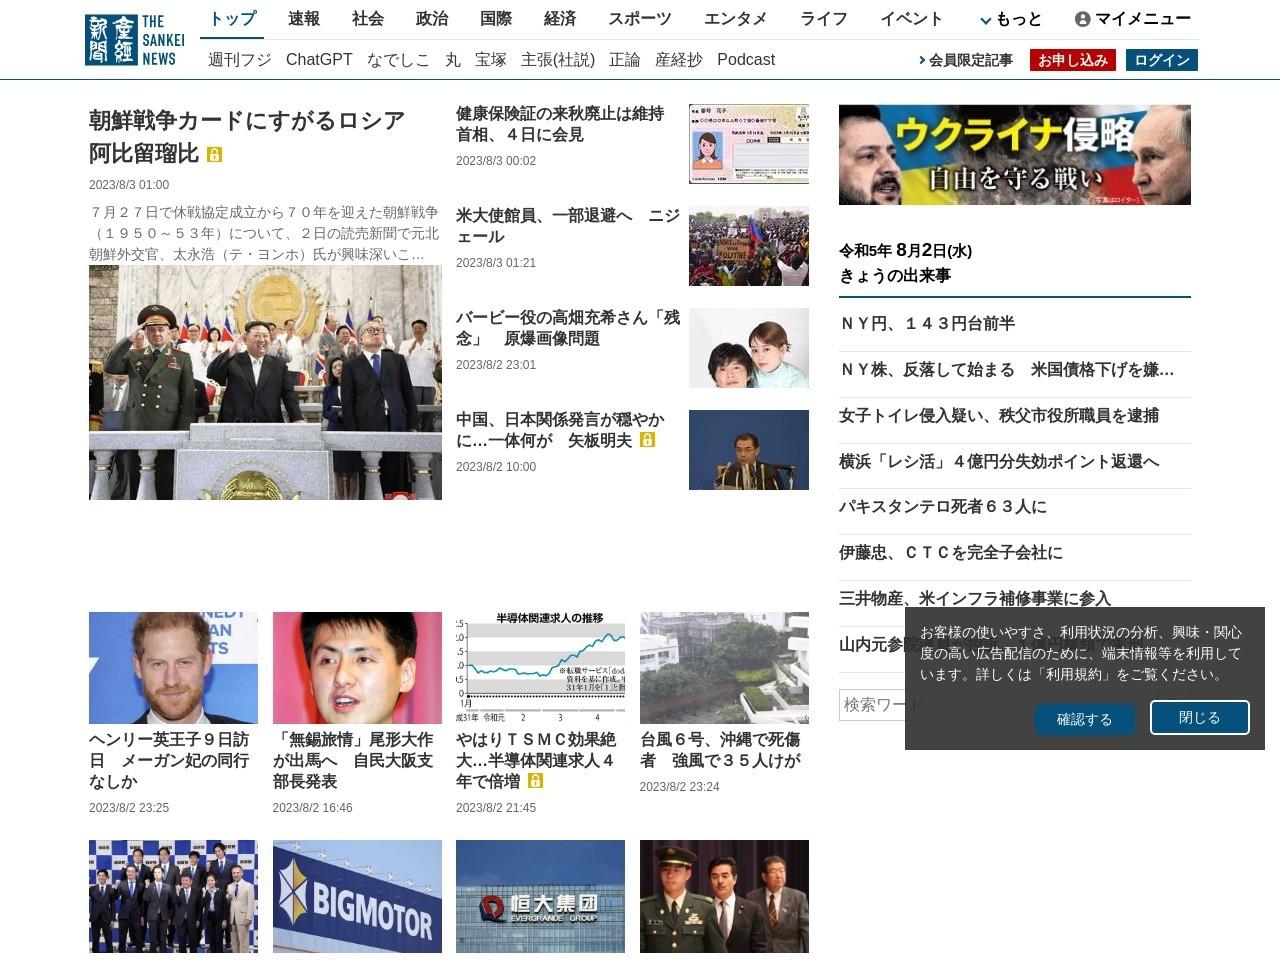 http://www.sankei.com/politics/news/171228/plt1712280005-n1.html